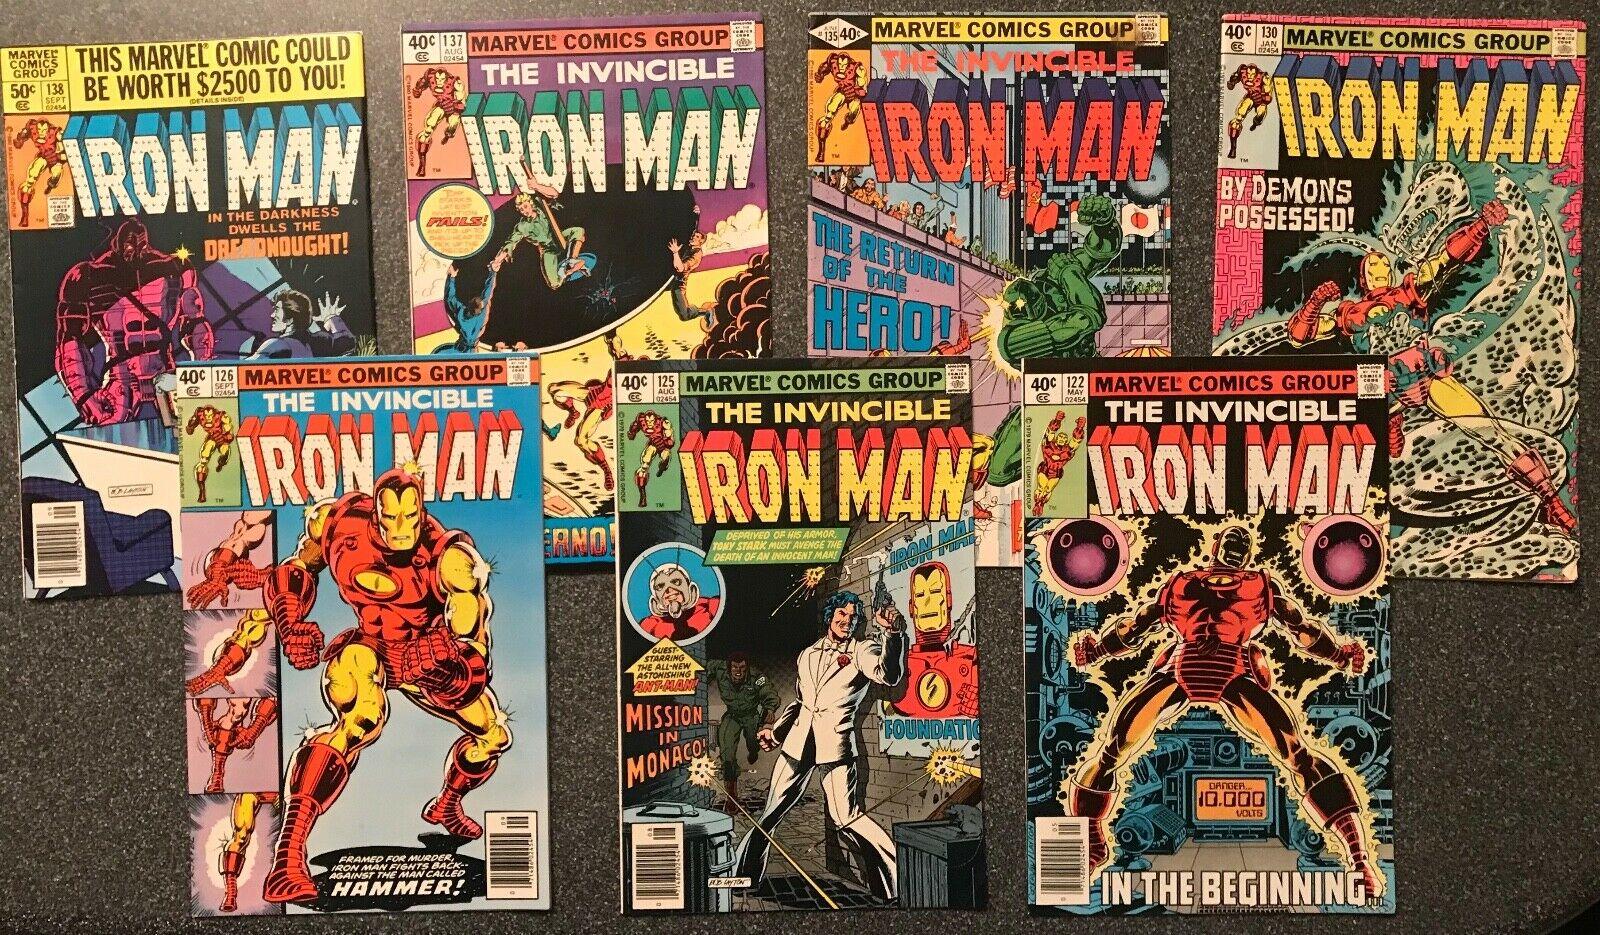 Iron Man #'s 122,125,126,130,135,137 &138 (7 Books) Marvel Comics